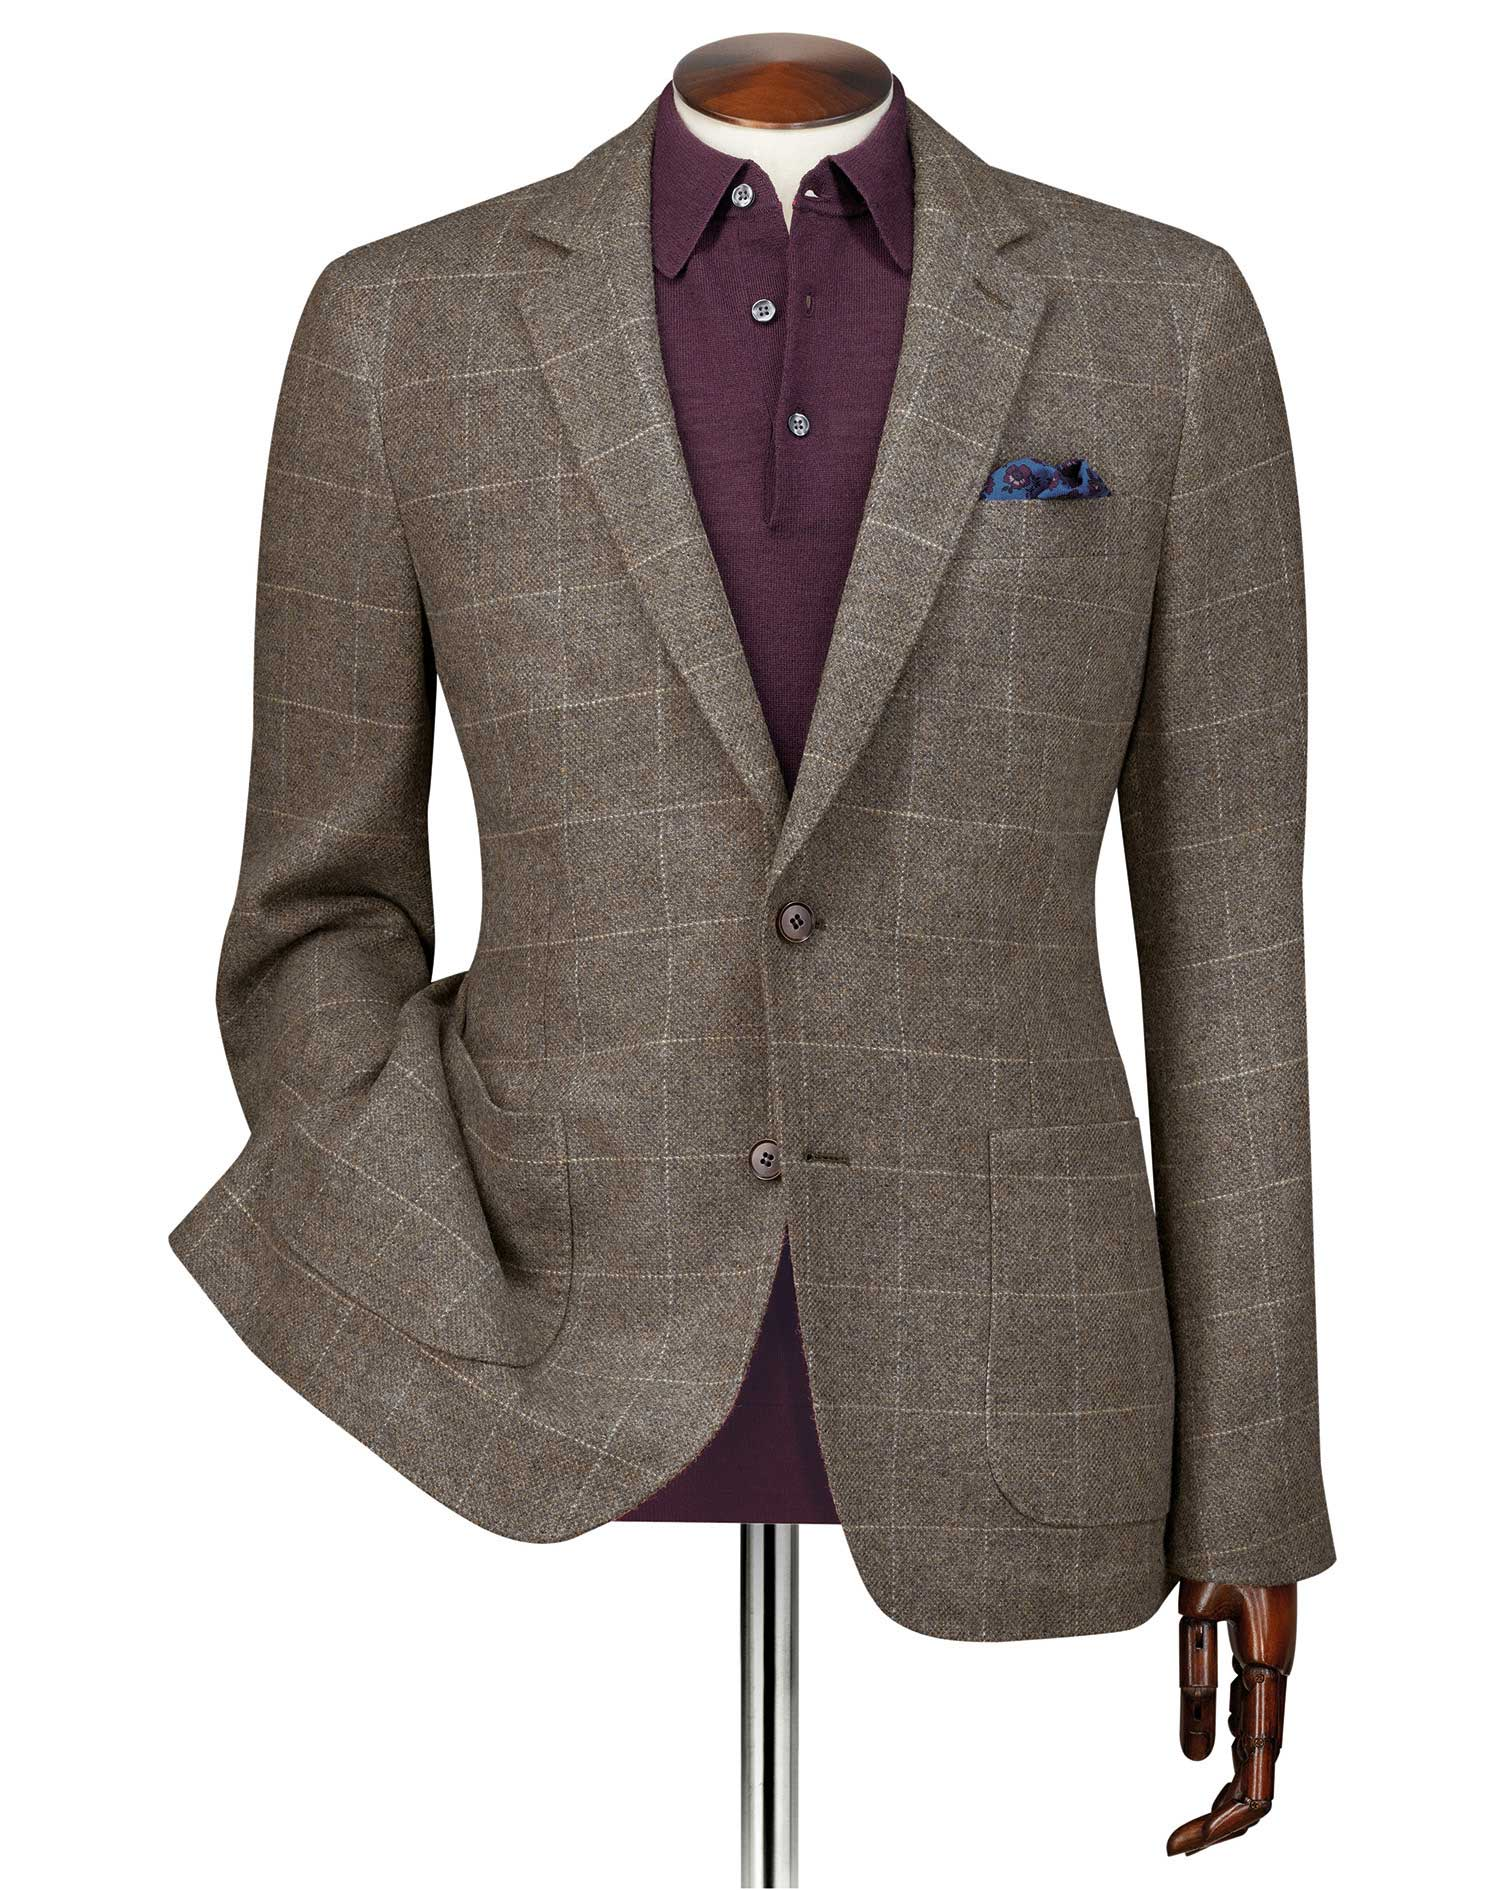 Slim Fit Brown Checkered Modern Wool Blazer Size 44 Long by Charles Tyrwhitt